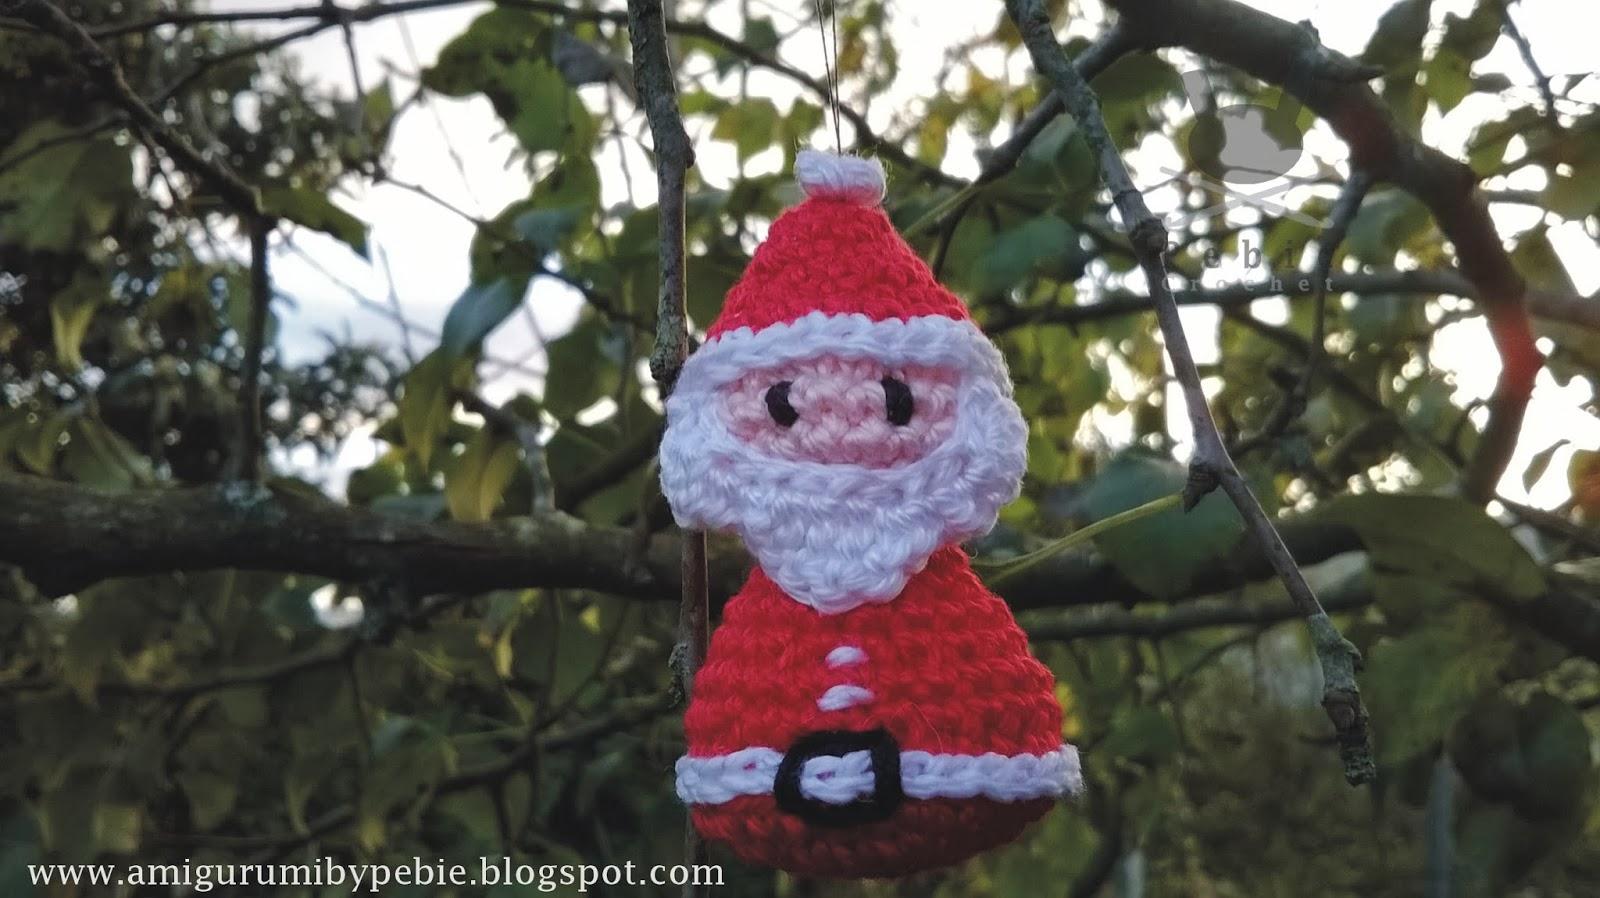 Amigurumi Christmas Decorations : Funny Amigurumi by Pebie: Christmas Ornament I